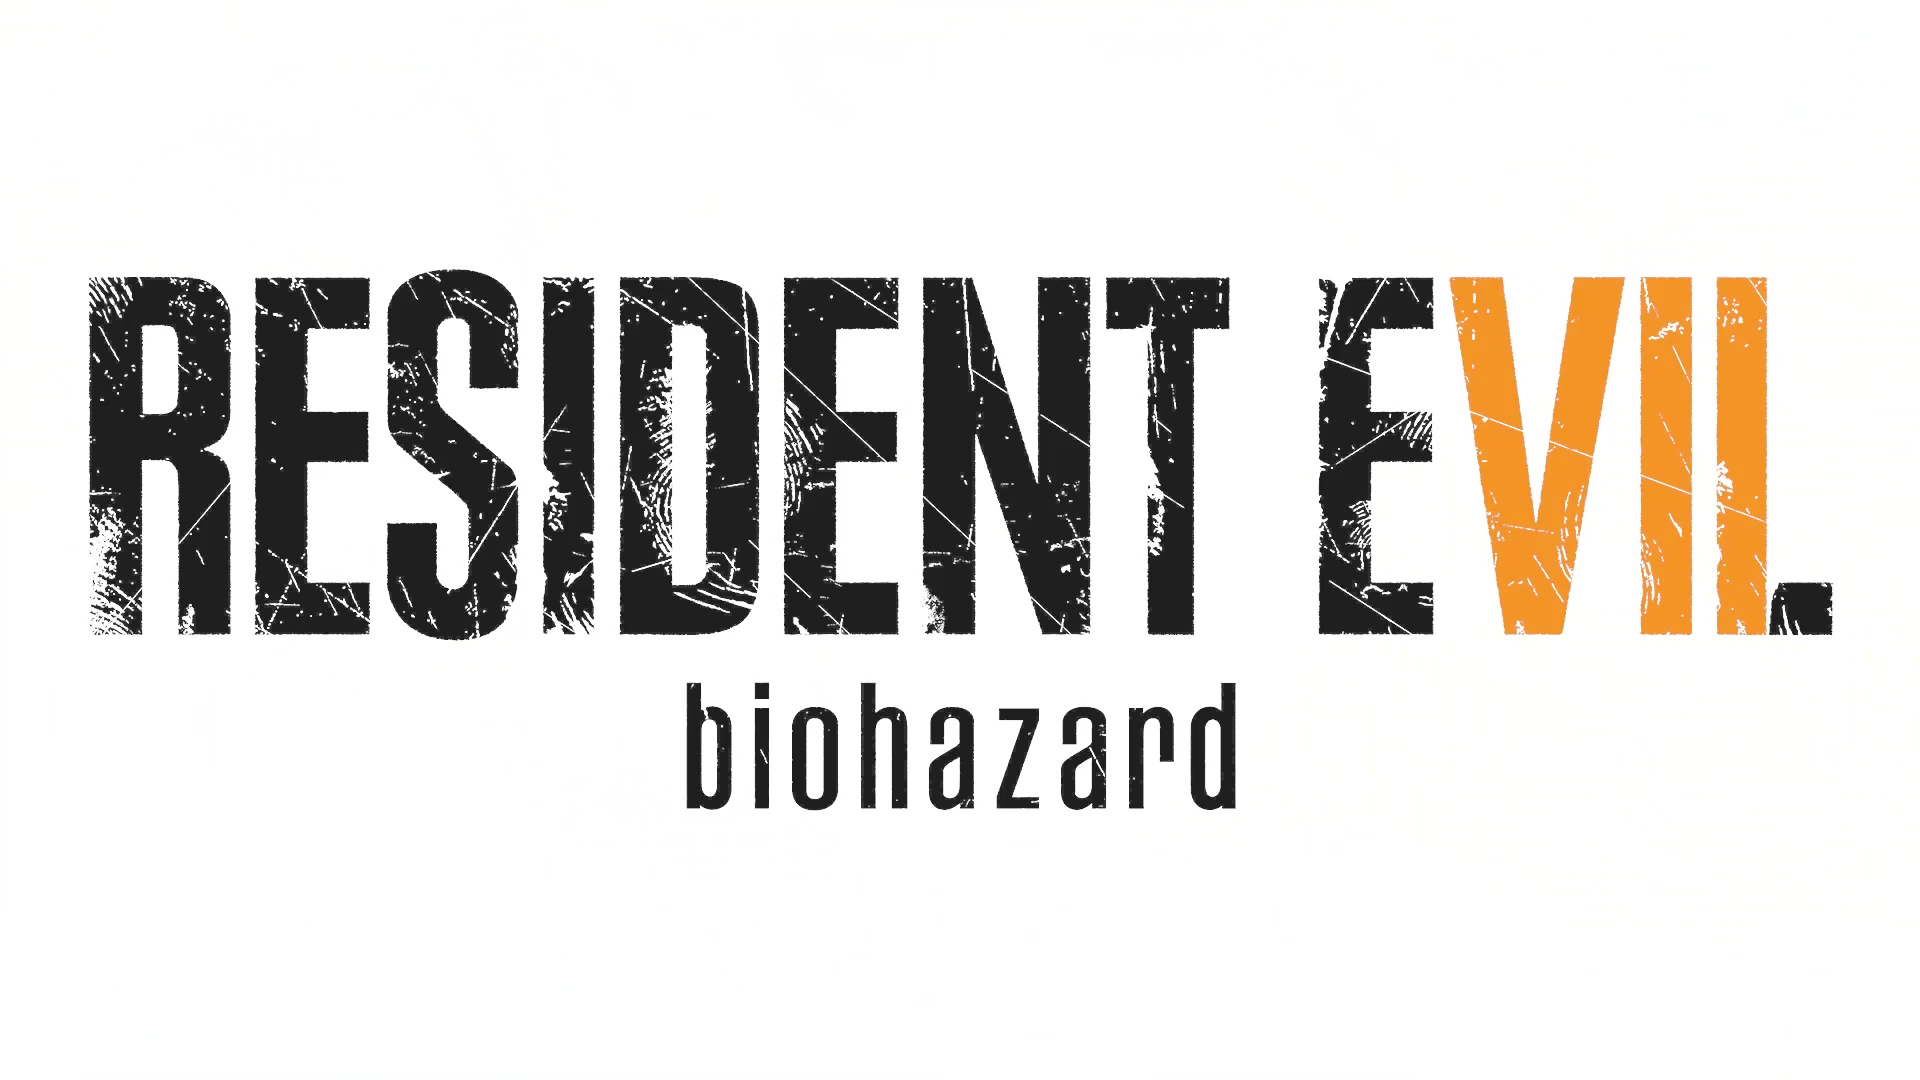 Review: RESIDENT EVIL VII: BIOHAZARD